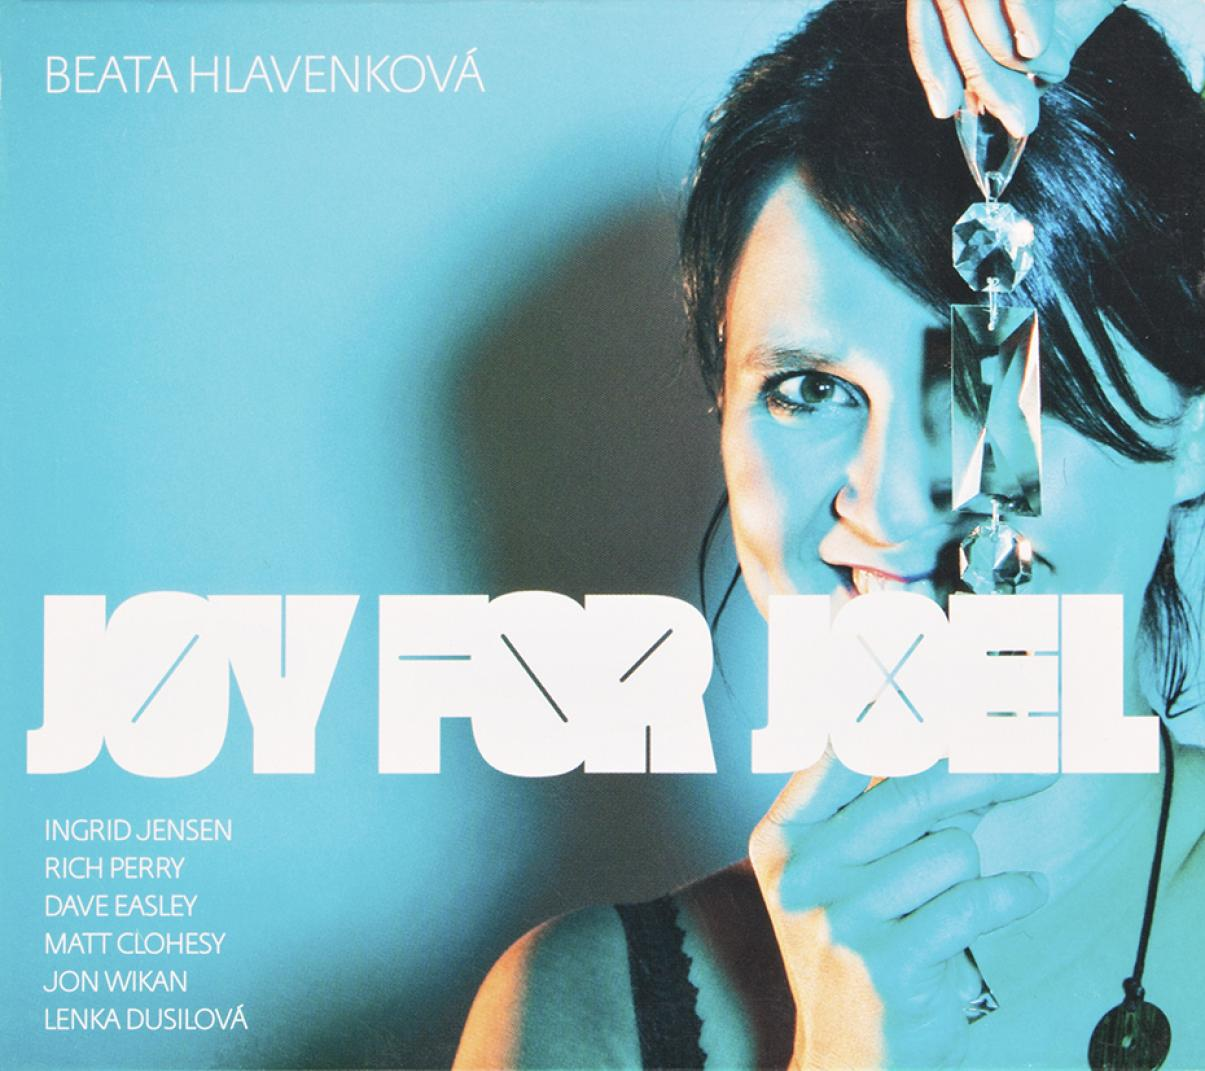 Beata Hlavenková: Joy for Joel